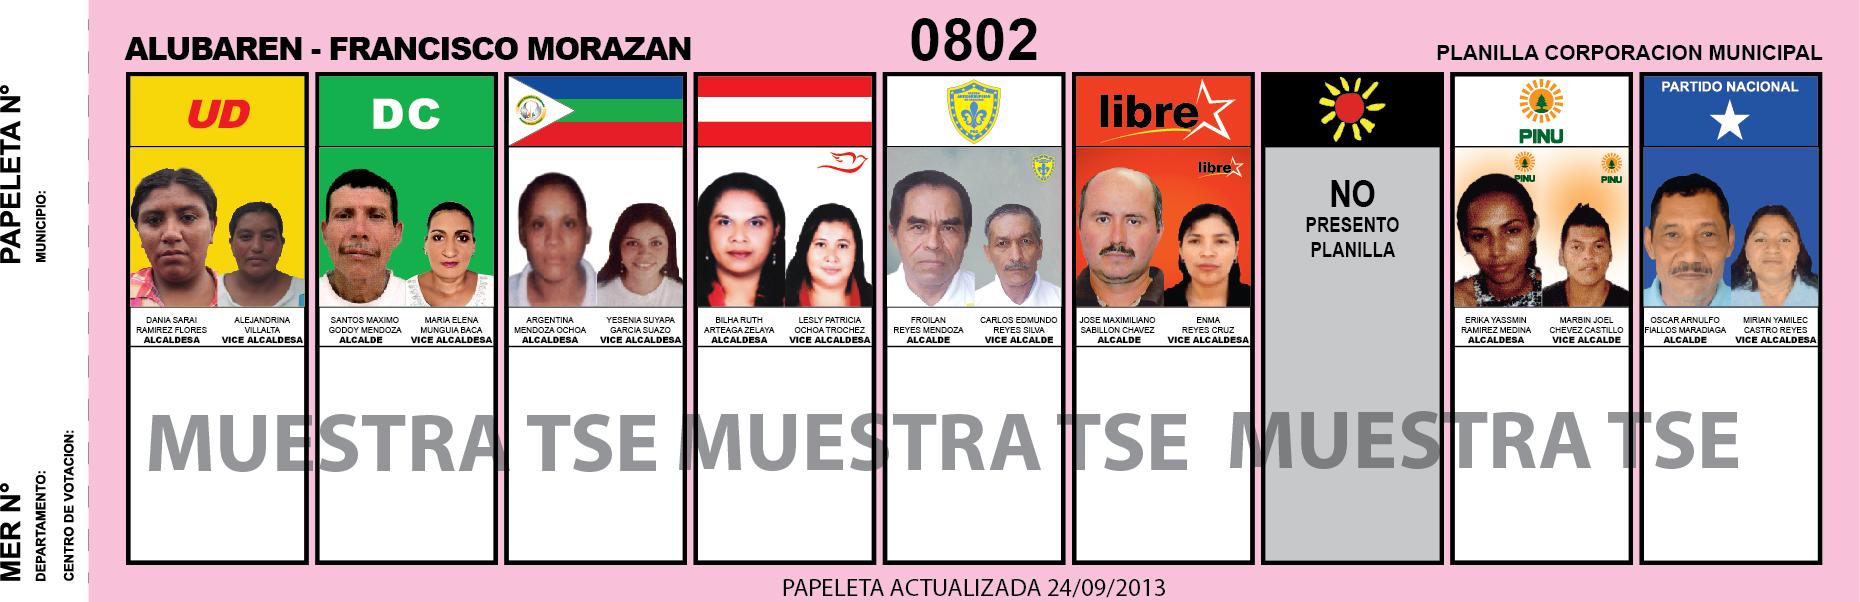 CANDIDATOS 2013 MUNICIPIO ALUBAREN - FRANCISCO MORAZAN - HONDURAS